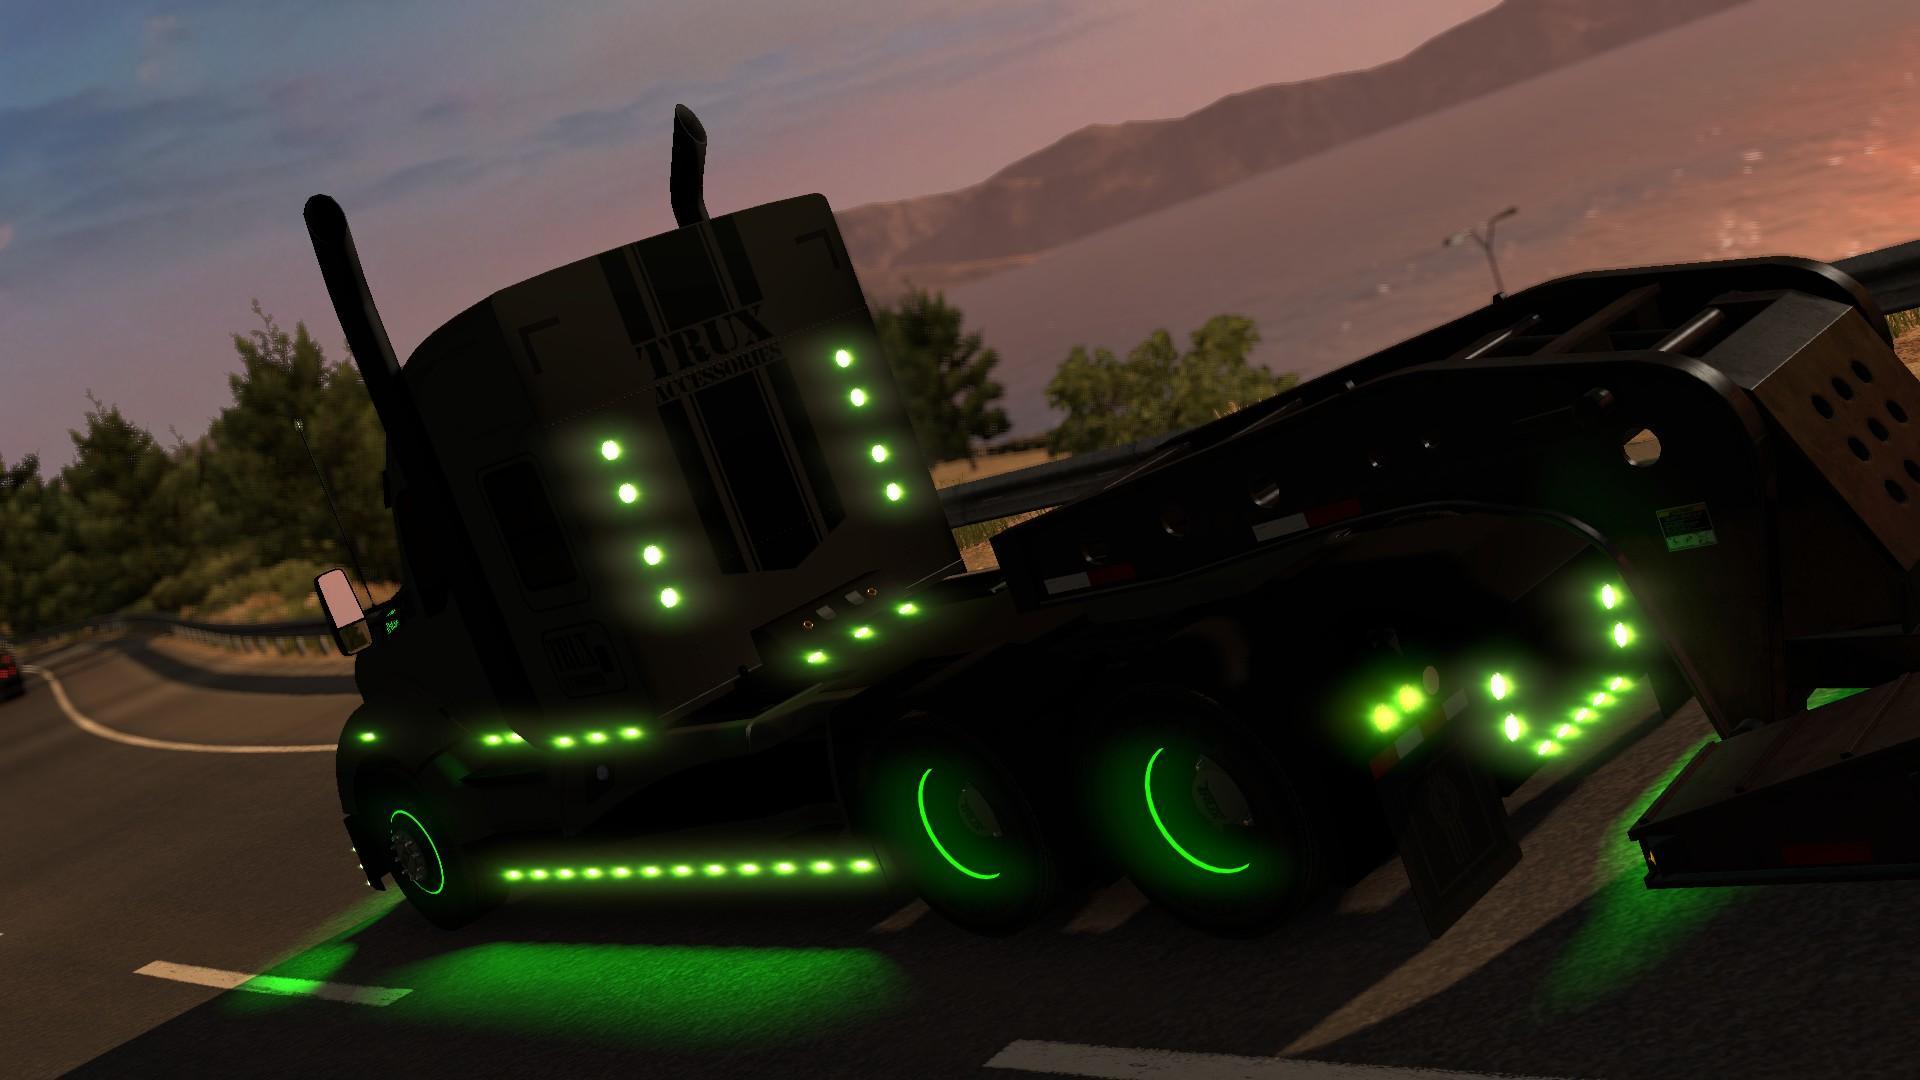 Kenworth T680 For Sale >> KENWORTH T680 THE GENERAL V1.0 1.29.X-1.30.X MOD Truck - ATS mod / American Truck Simulator mod